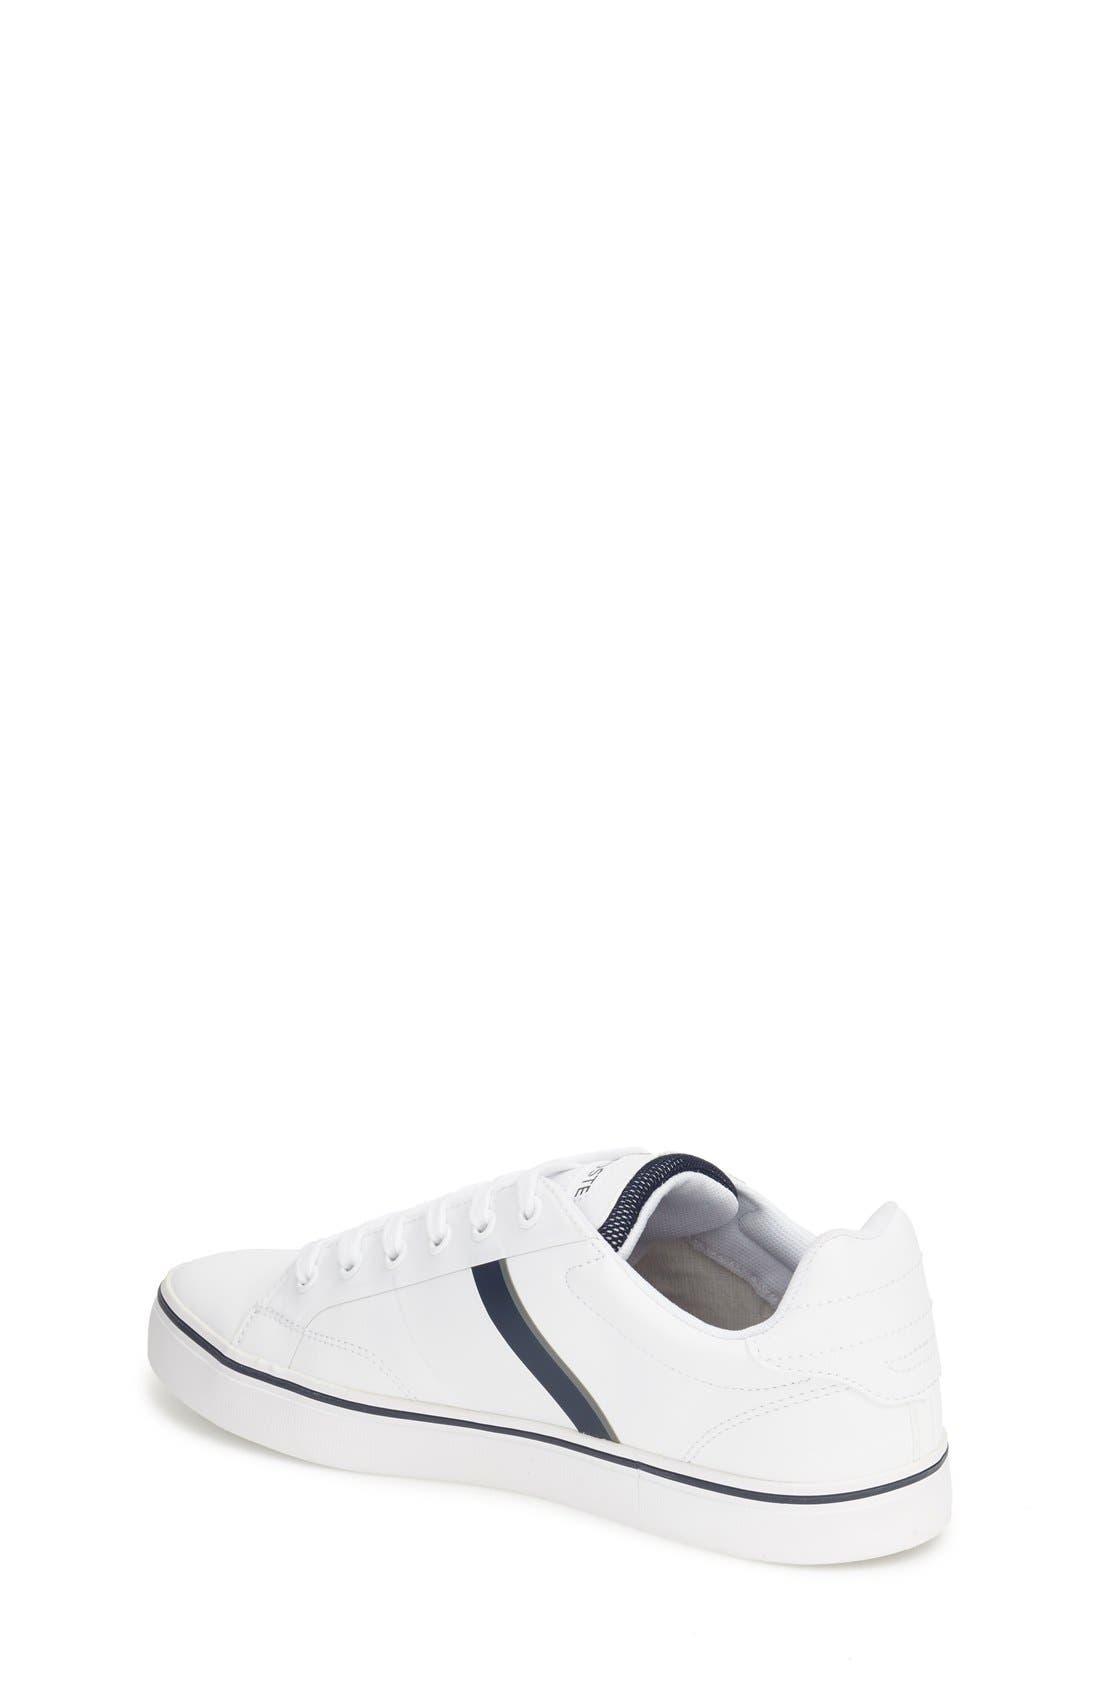 Alternate Image 2  - Lacoste 'Fairland' Sneaker (Women)